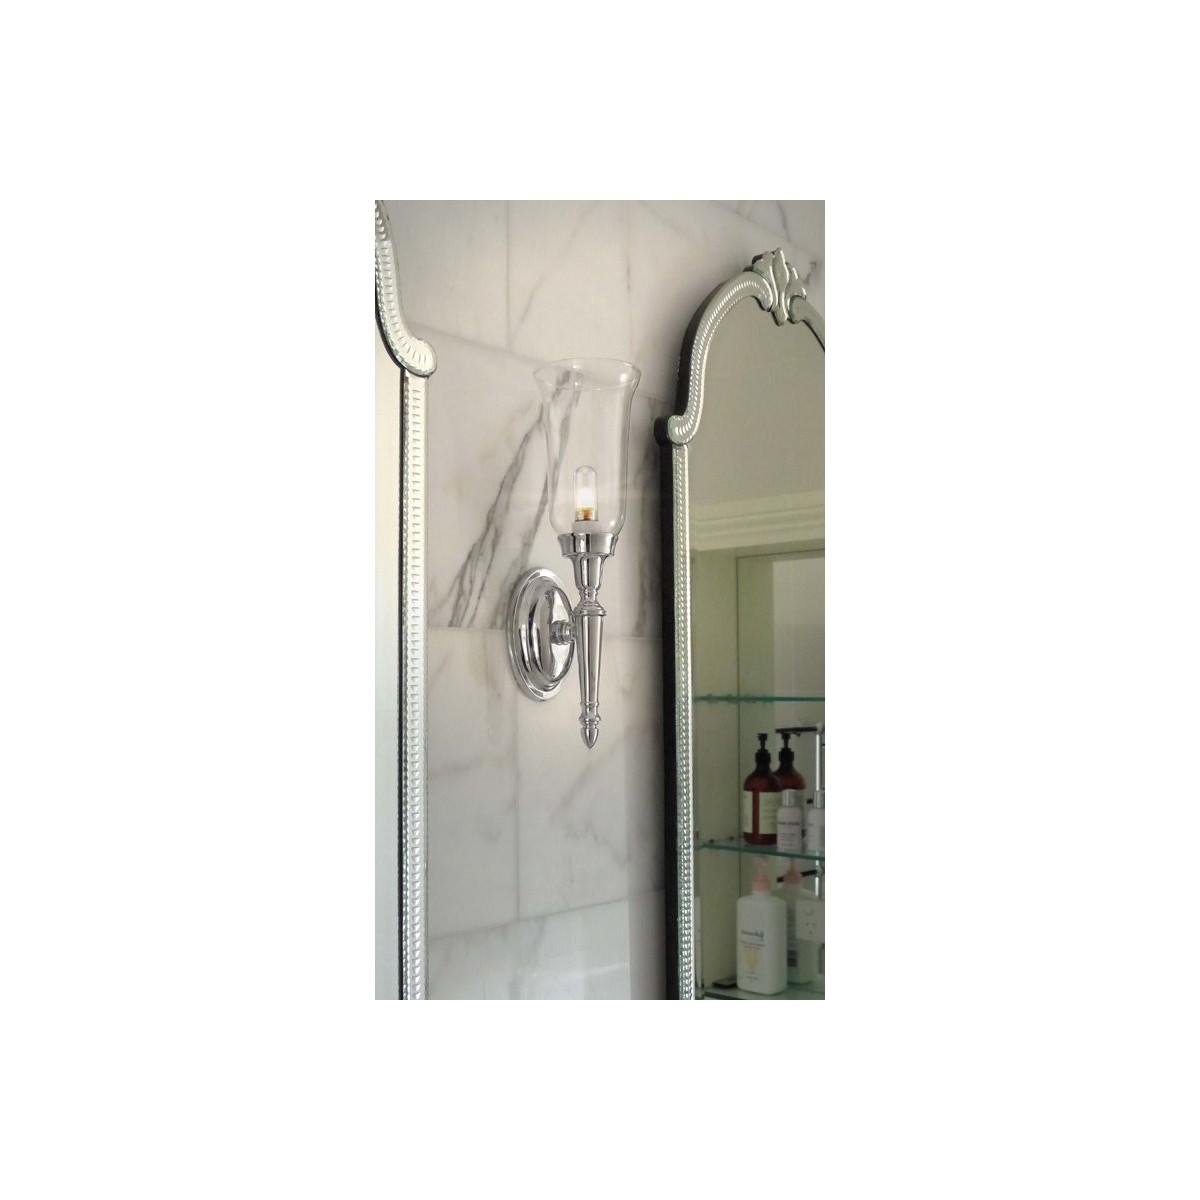 Elstead Lighting Interior Kinkiet ŁAZIENKOWY DRYDEN2 1x40W G9 BATH/DRYDEN2 PC